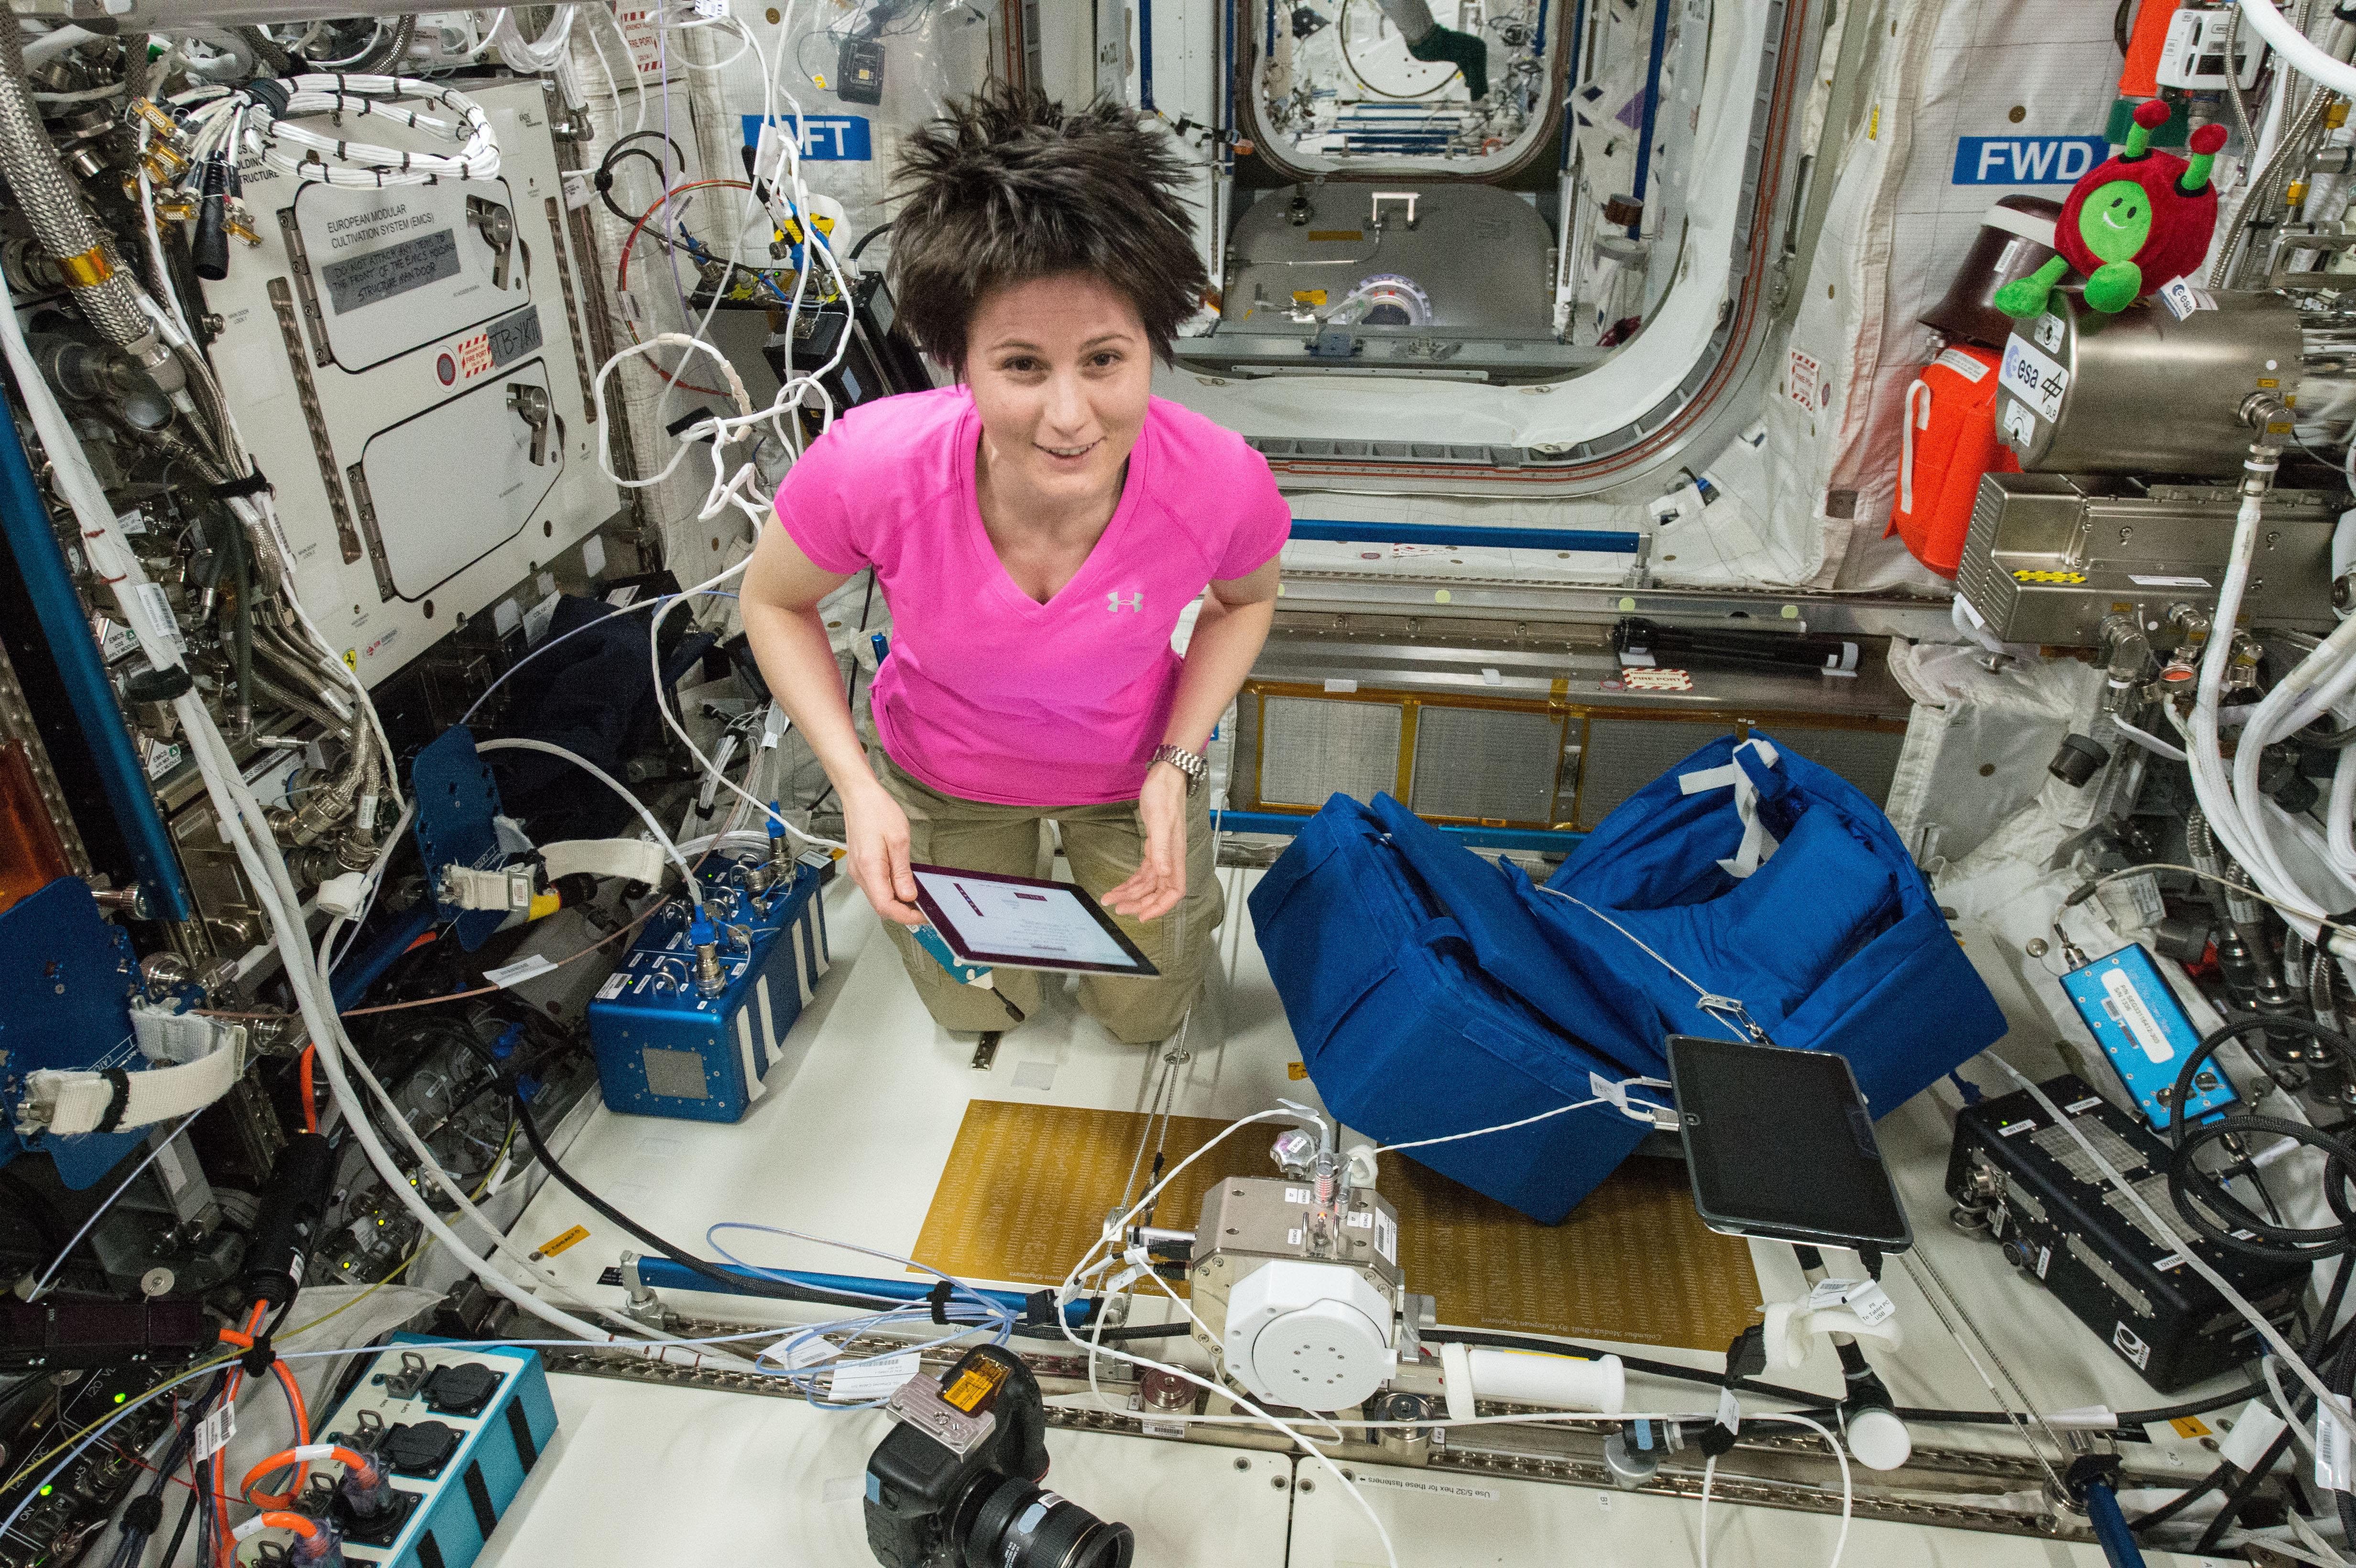 european space agency astronaut jobs - photo #31